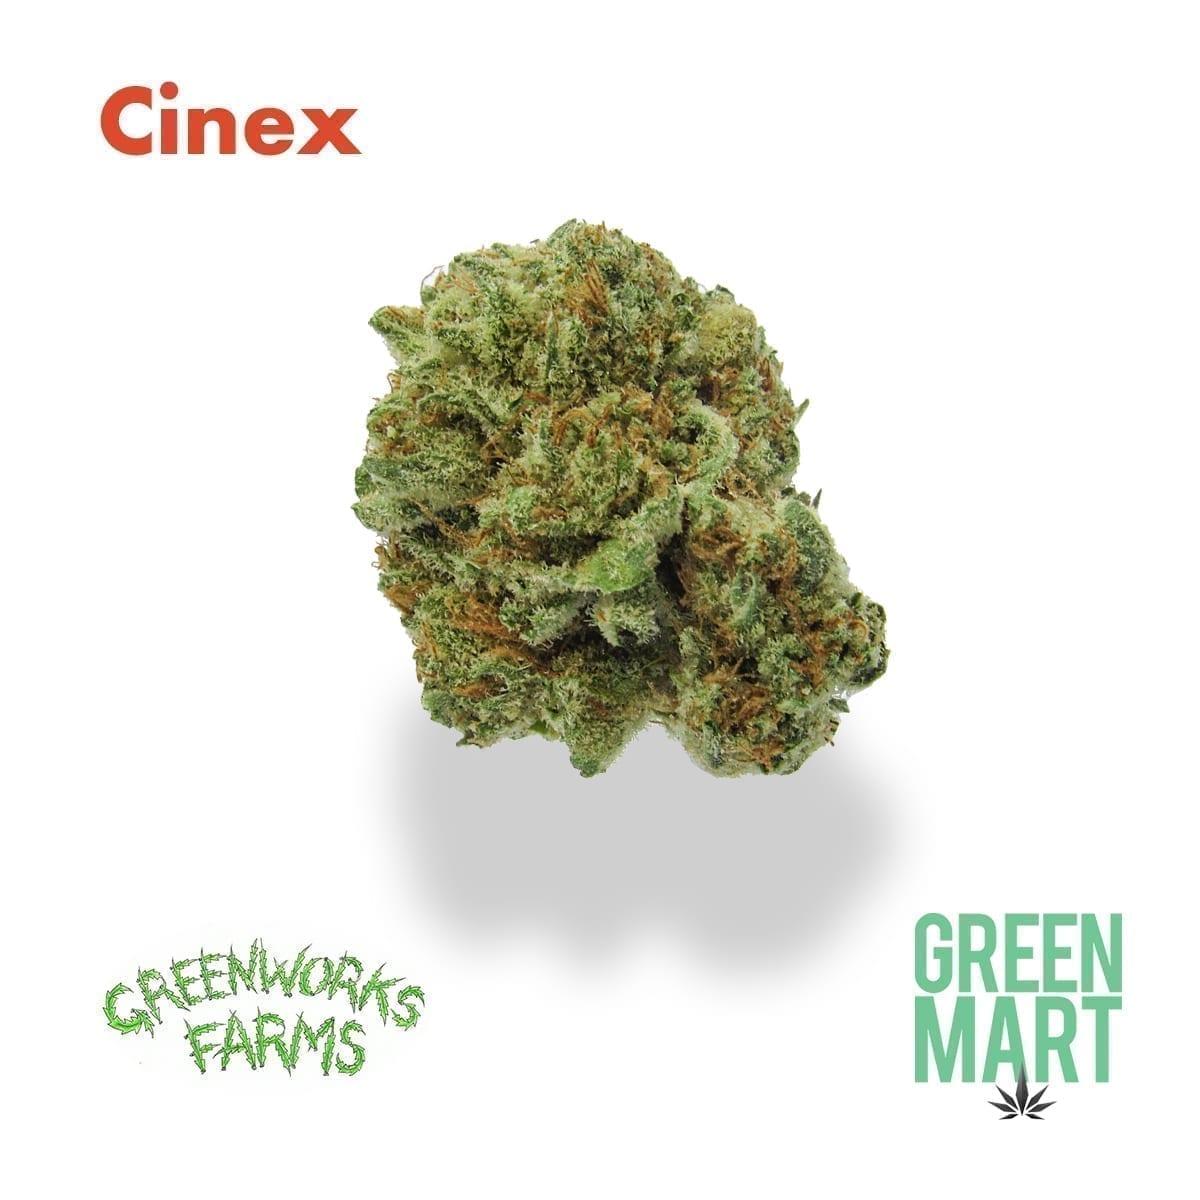 Greenworks Farms- Cinex